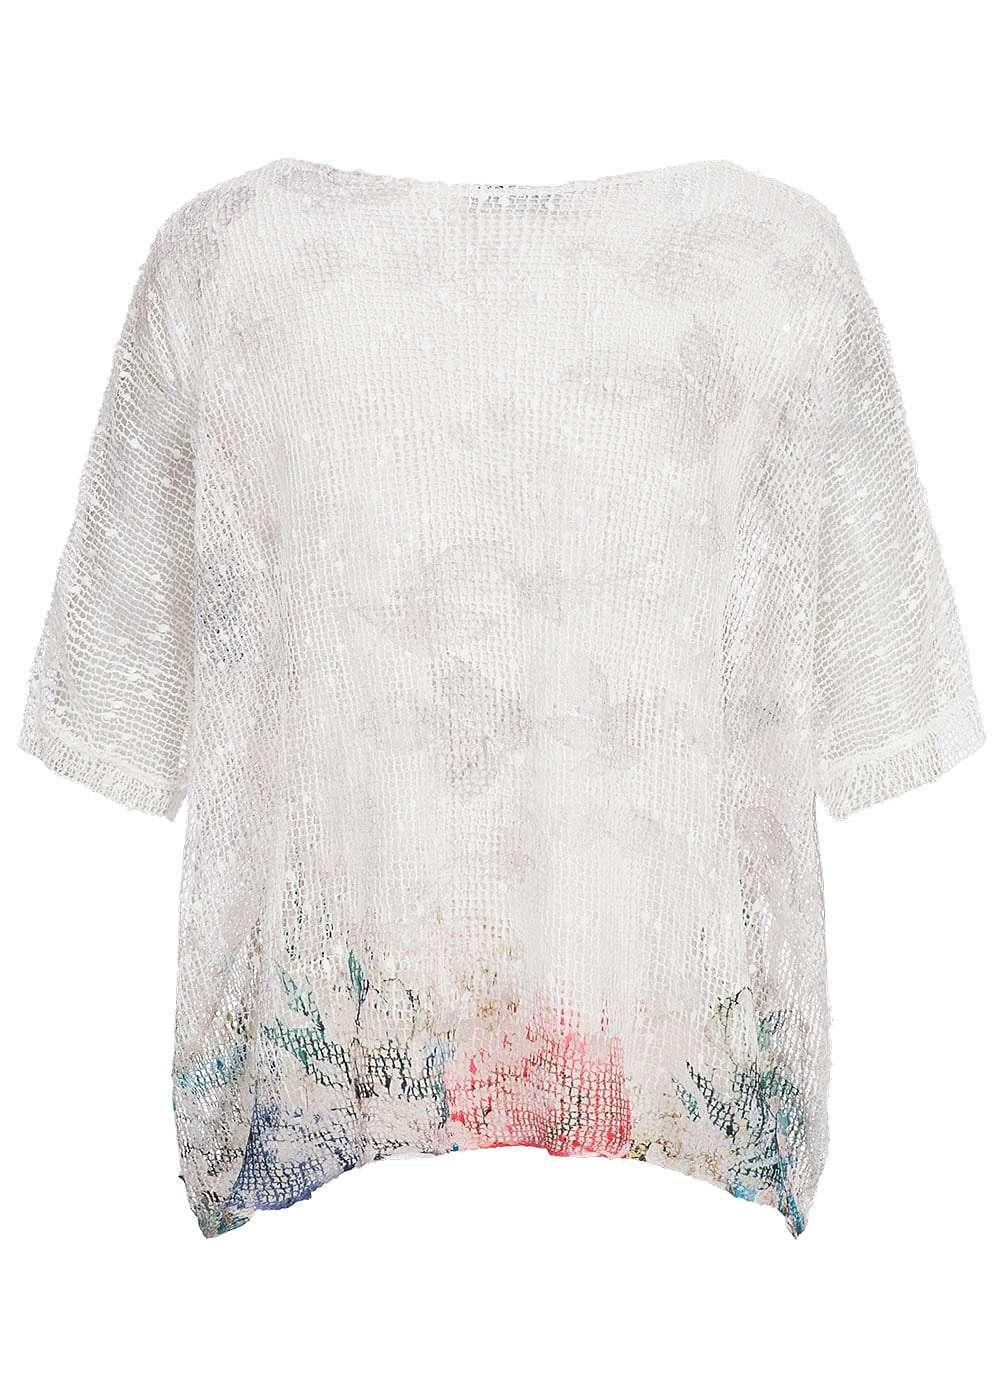 styleboom fashion damen shirt oversize 2 lagig netz optik pailletten grau weiss 77onlineshop. Black Bedroom Furniture Sets. Home Design Ideas